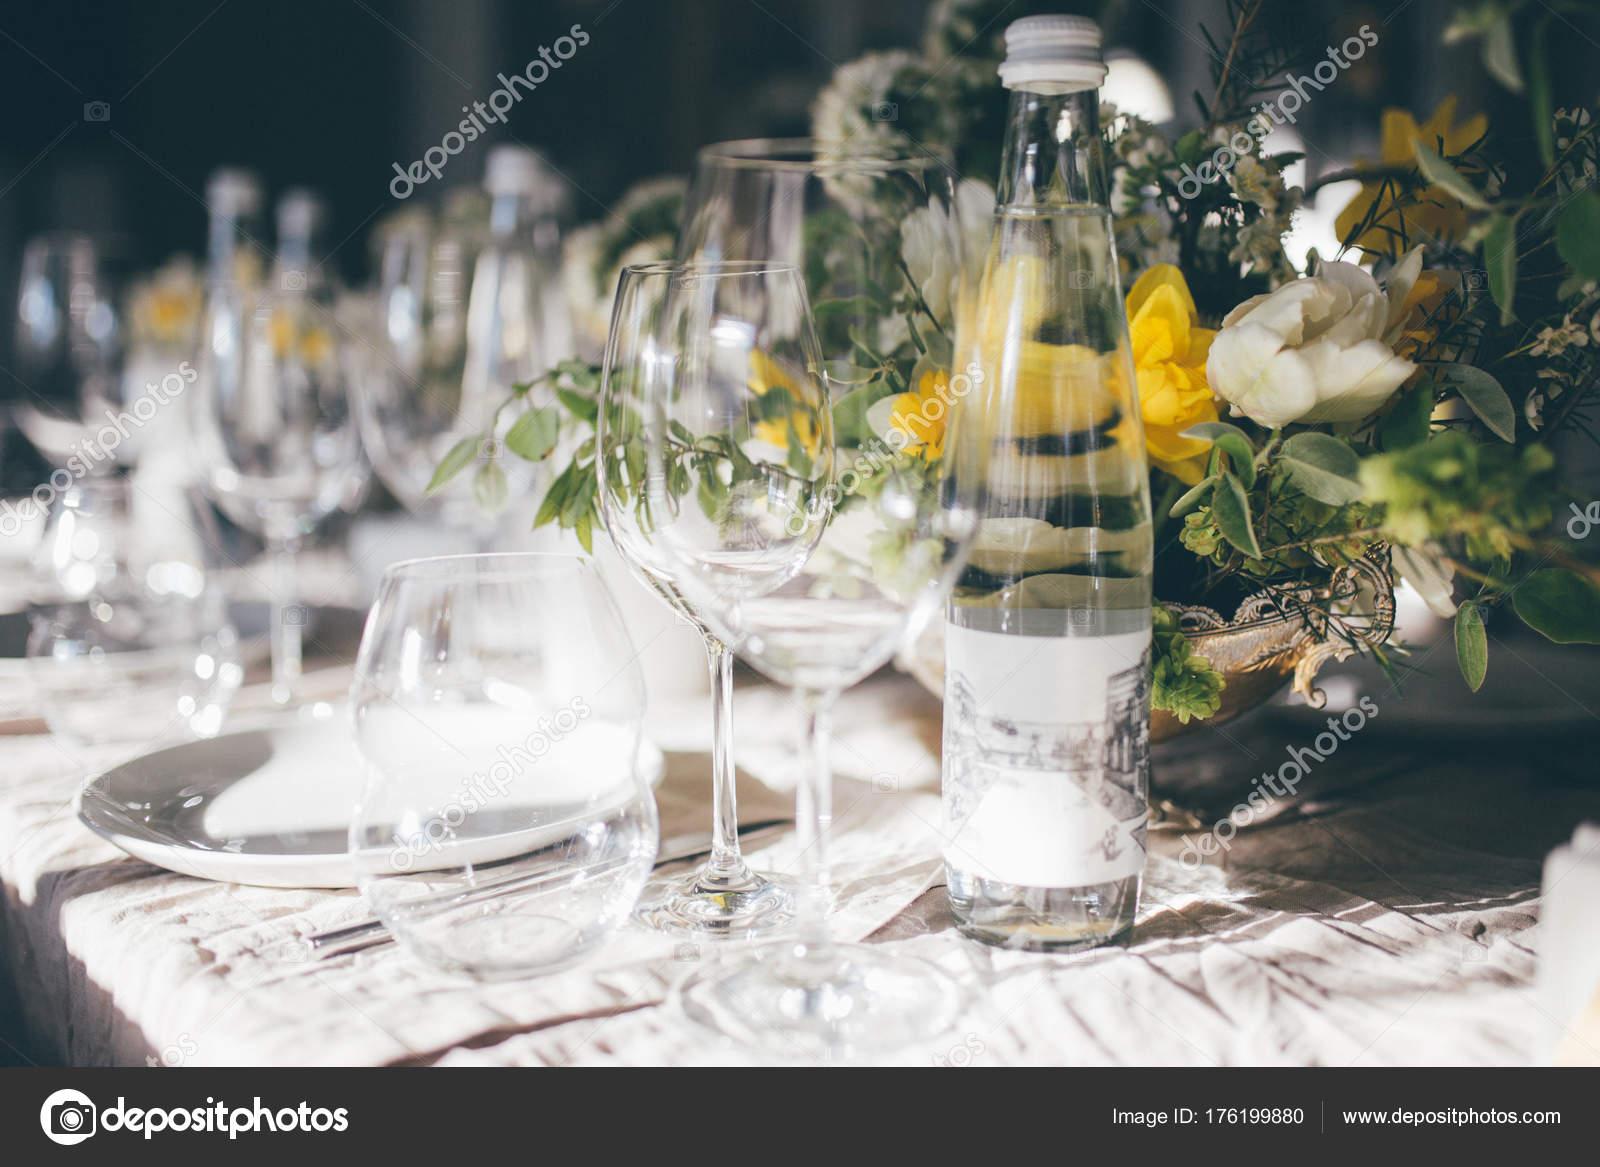 Beautiful Festive Table Setting Closeup Wedding Festive Interior Table Decorations u2014 Stock Photo & Beautiful Festive Table Setting Closeup Wedding Festive Interior ...